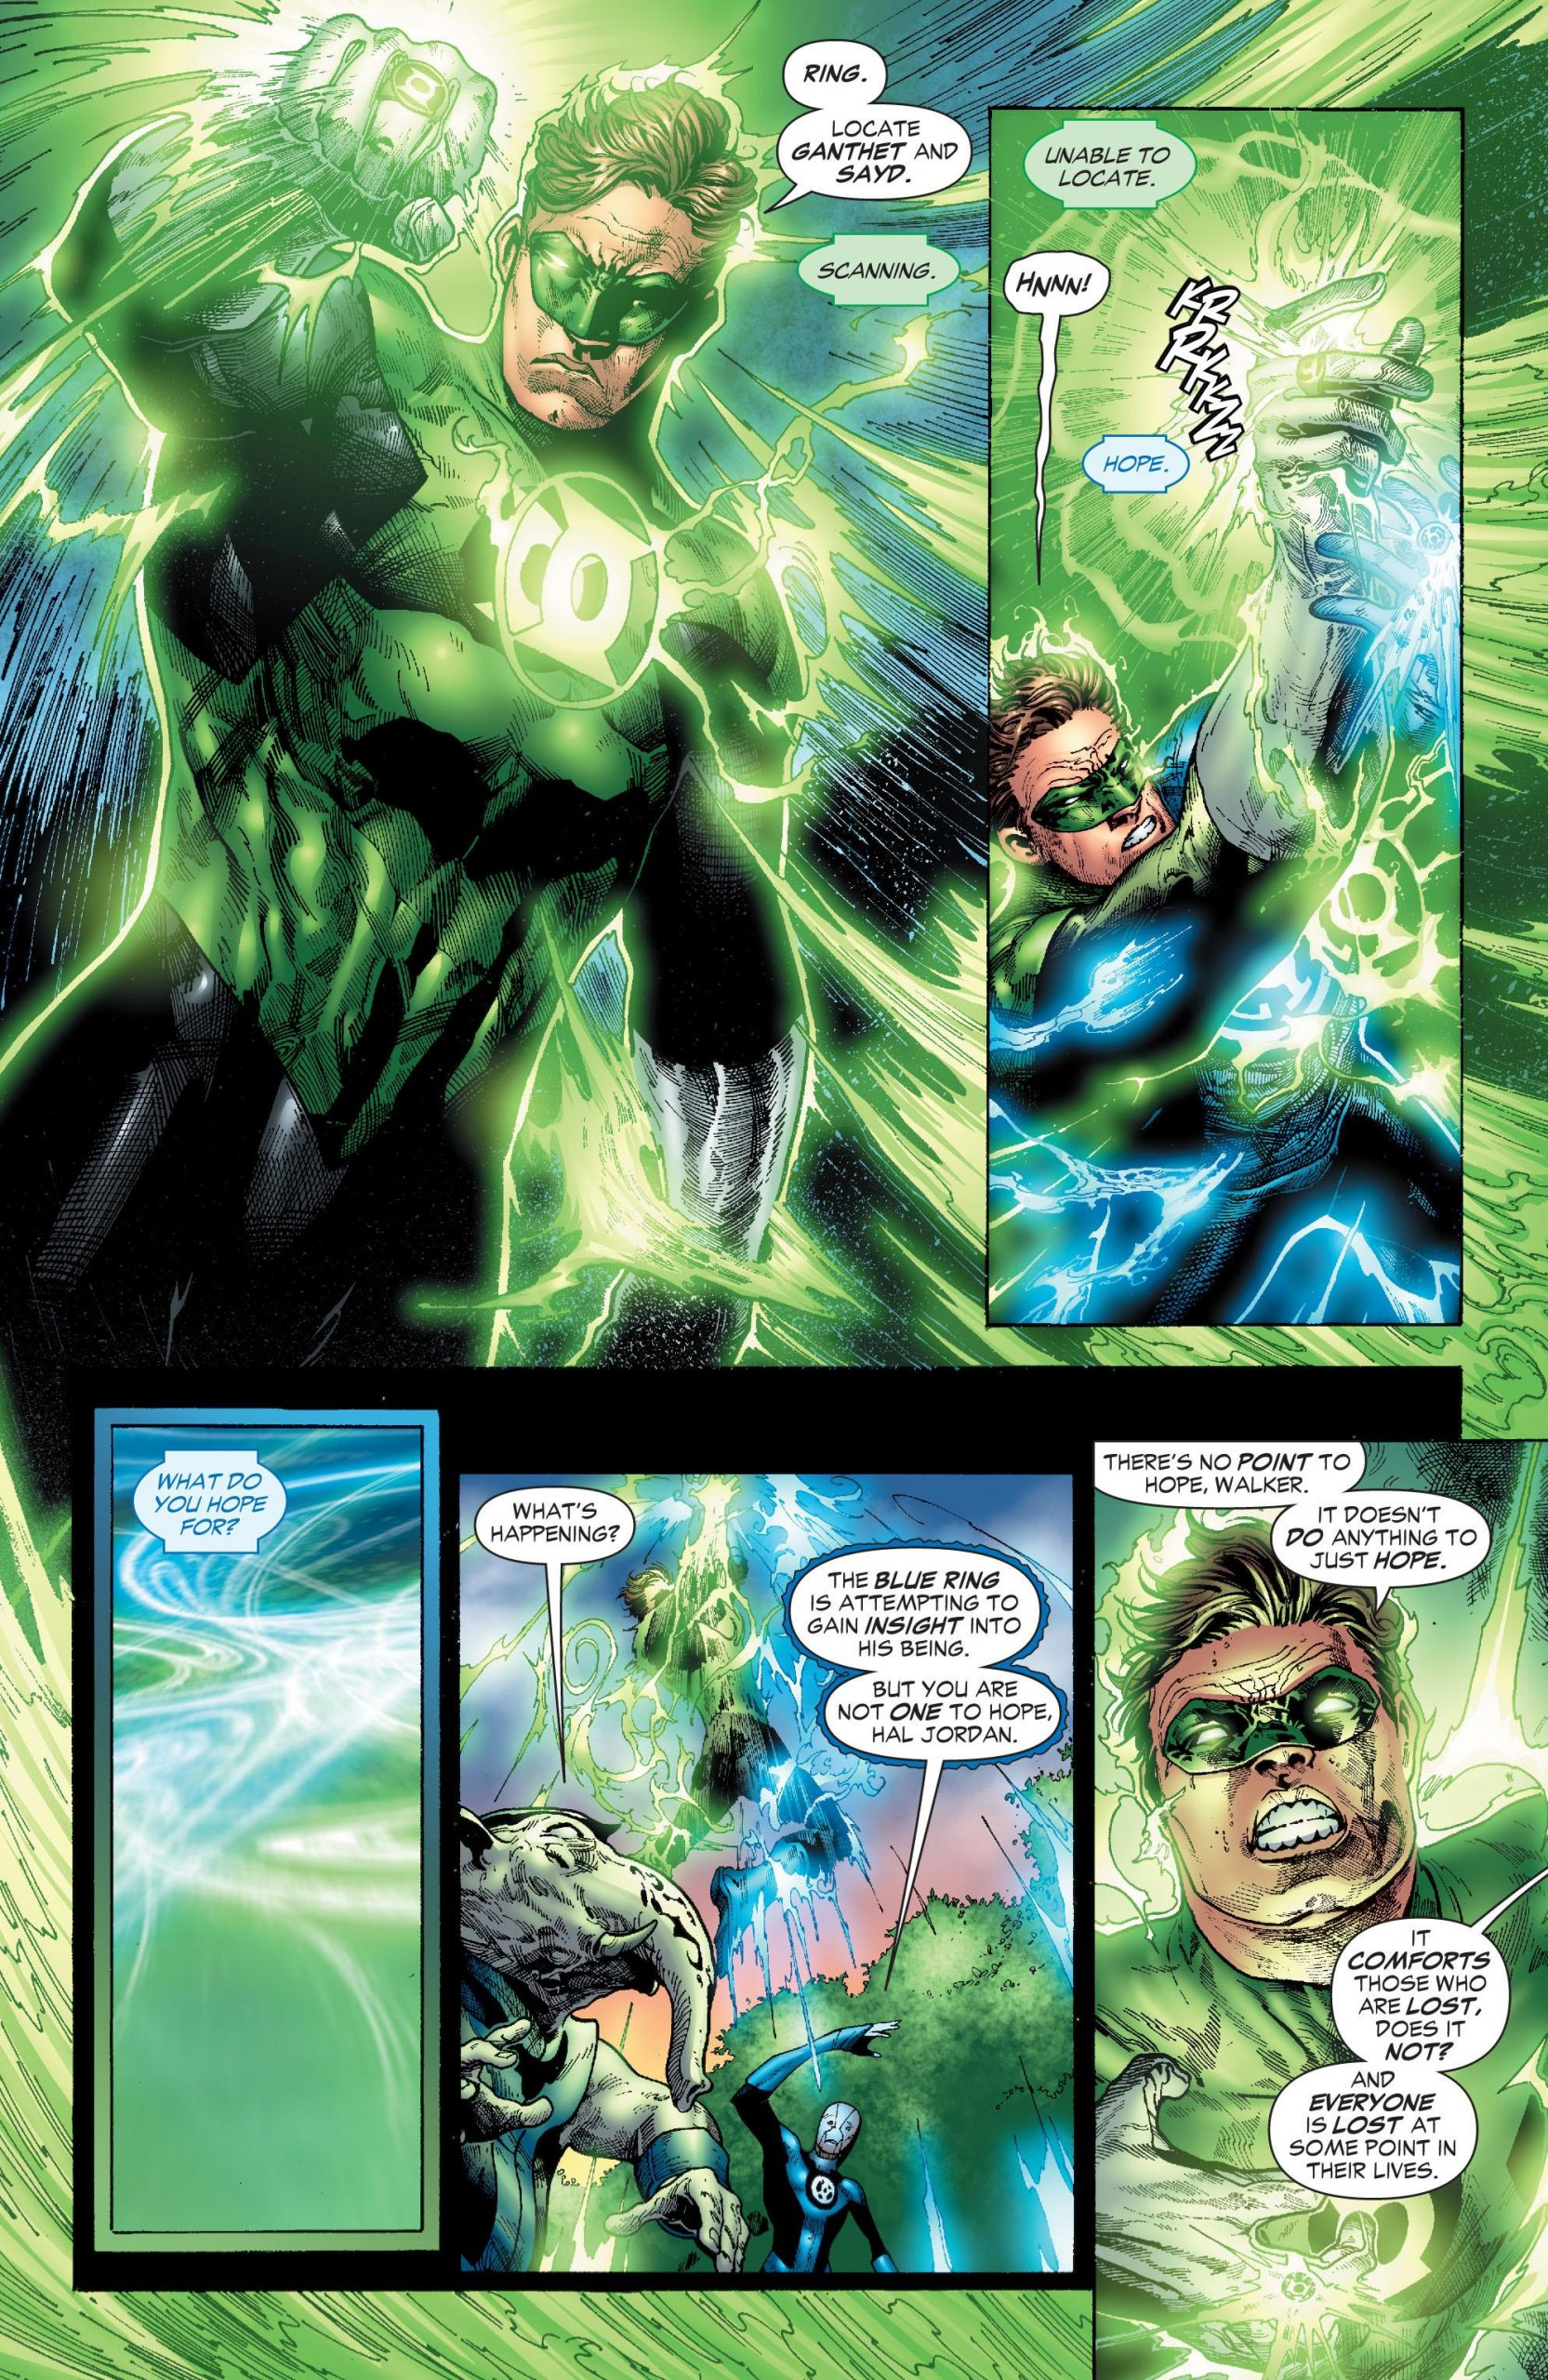 Green Lantern - Agent Orange review